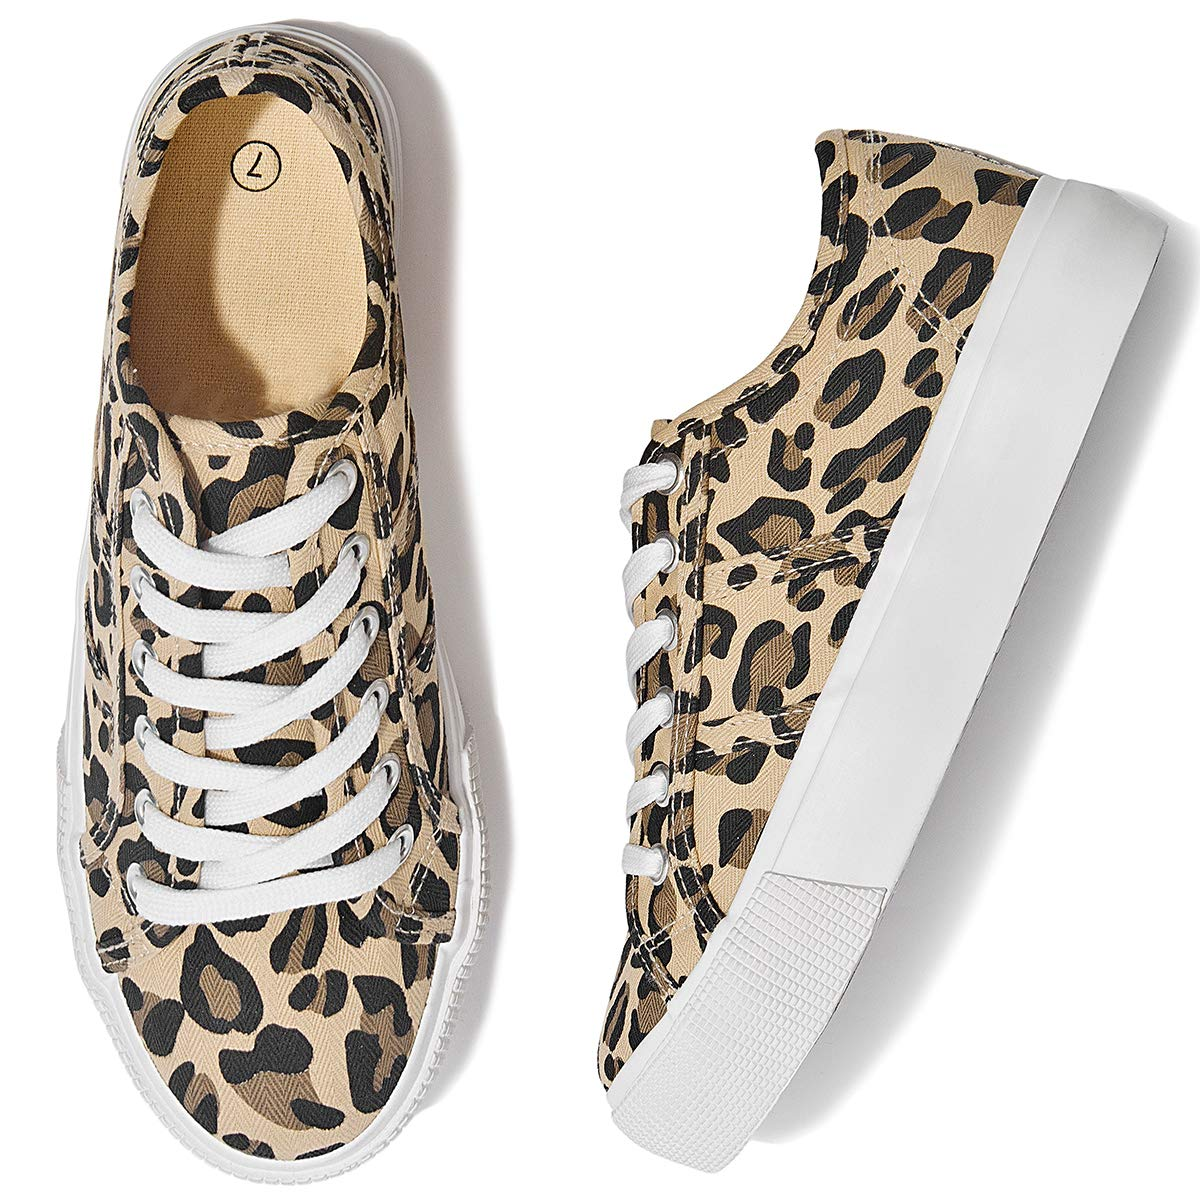 Adokoo Damen Sneakers Leopardenmuster